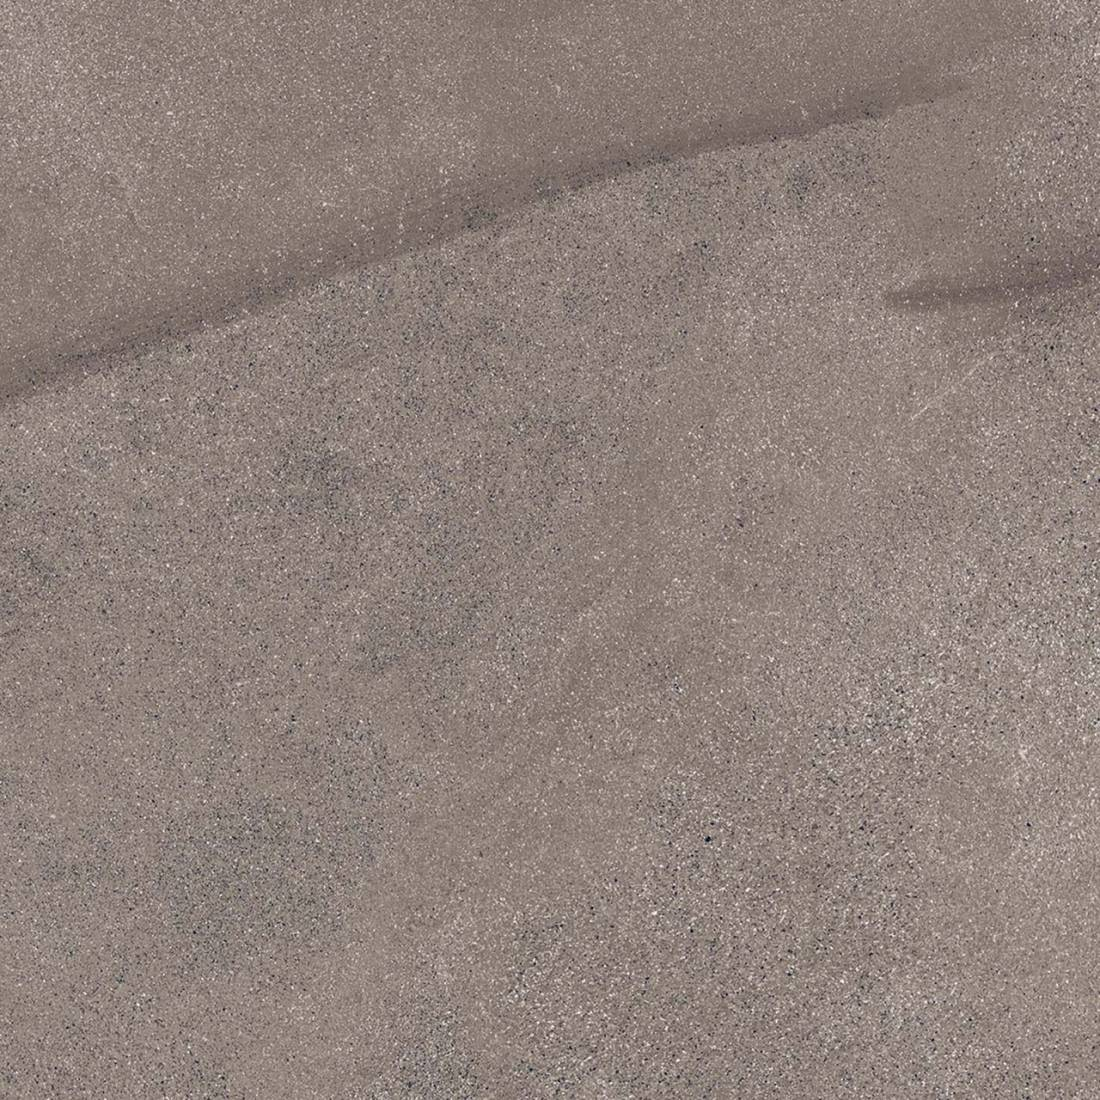 Quartzite 60x60 Gris Polished 1